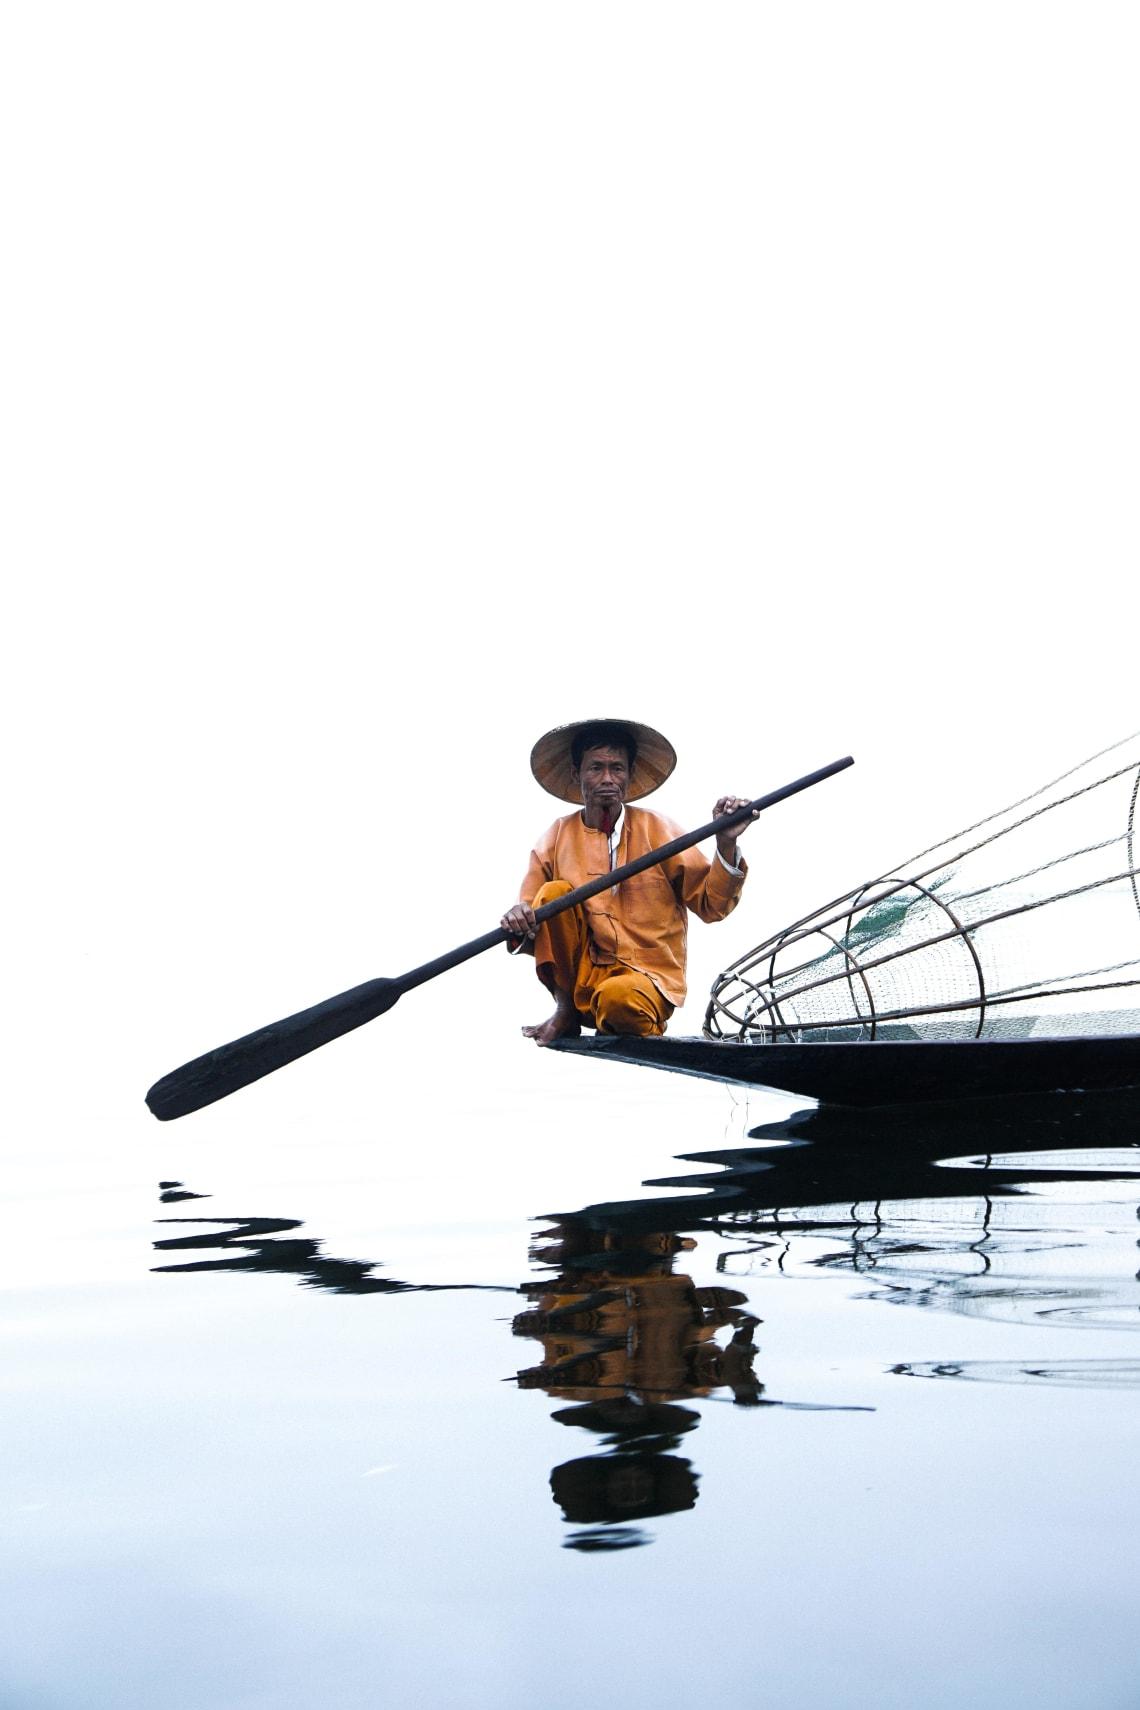 Backpacking Myanmar itinerary: Inle Lake